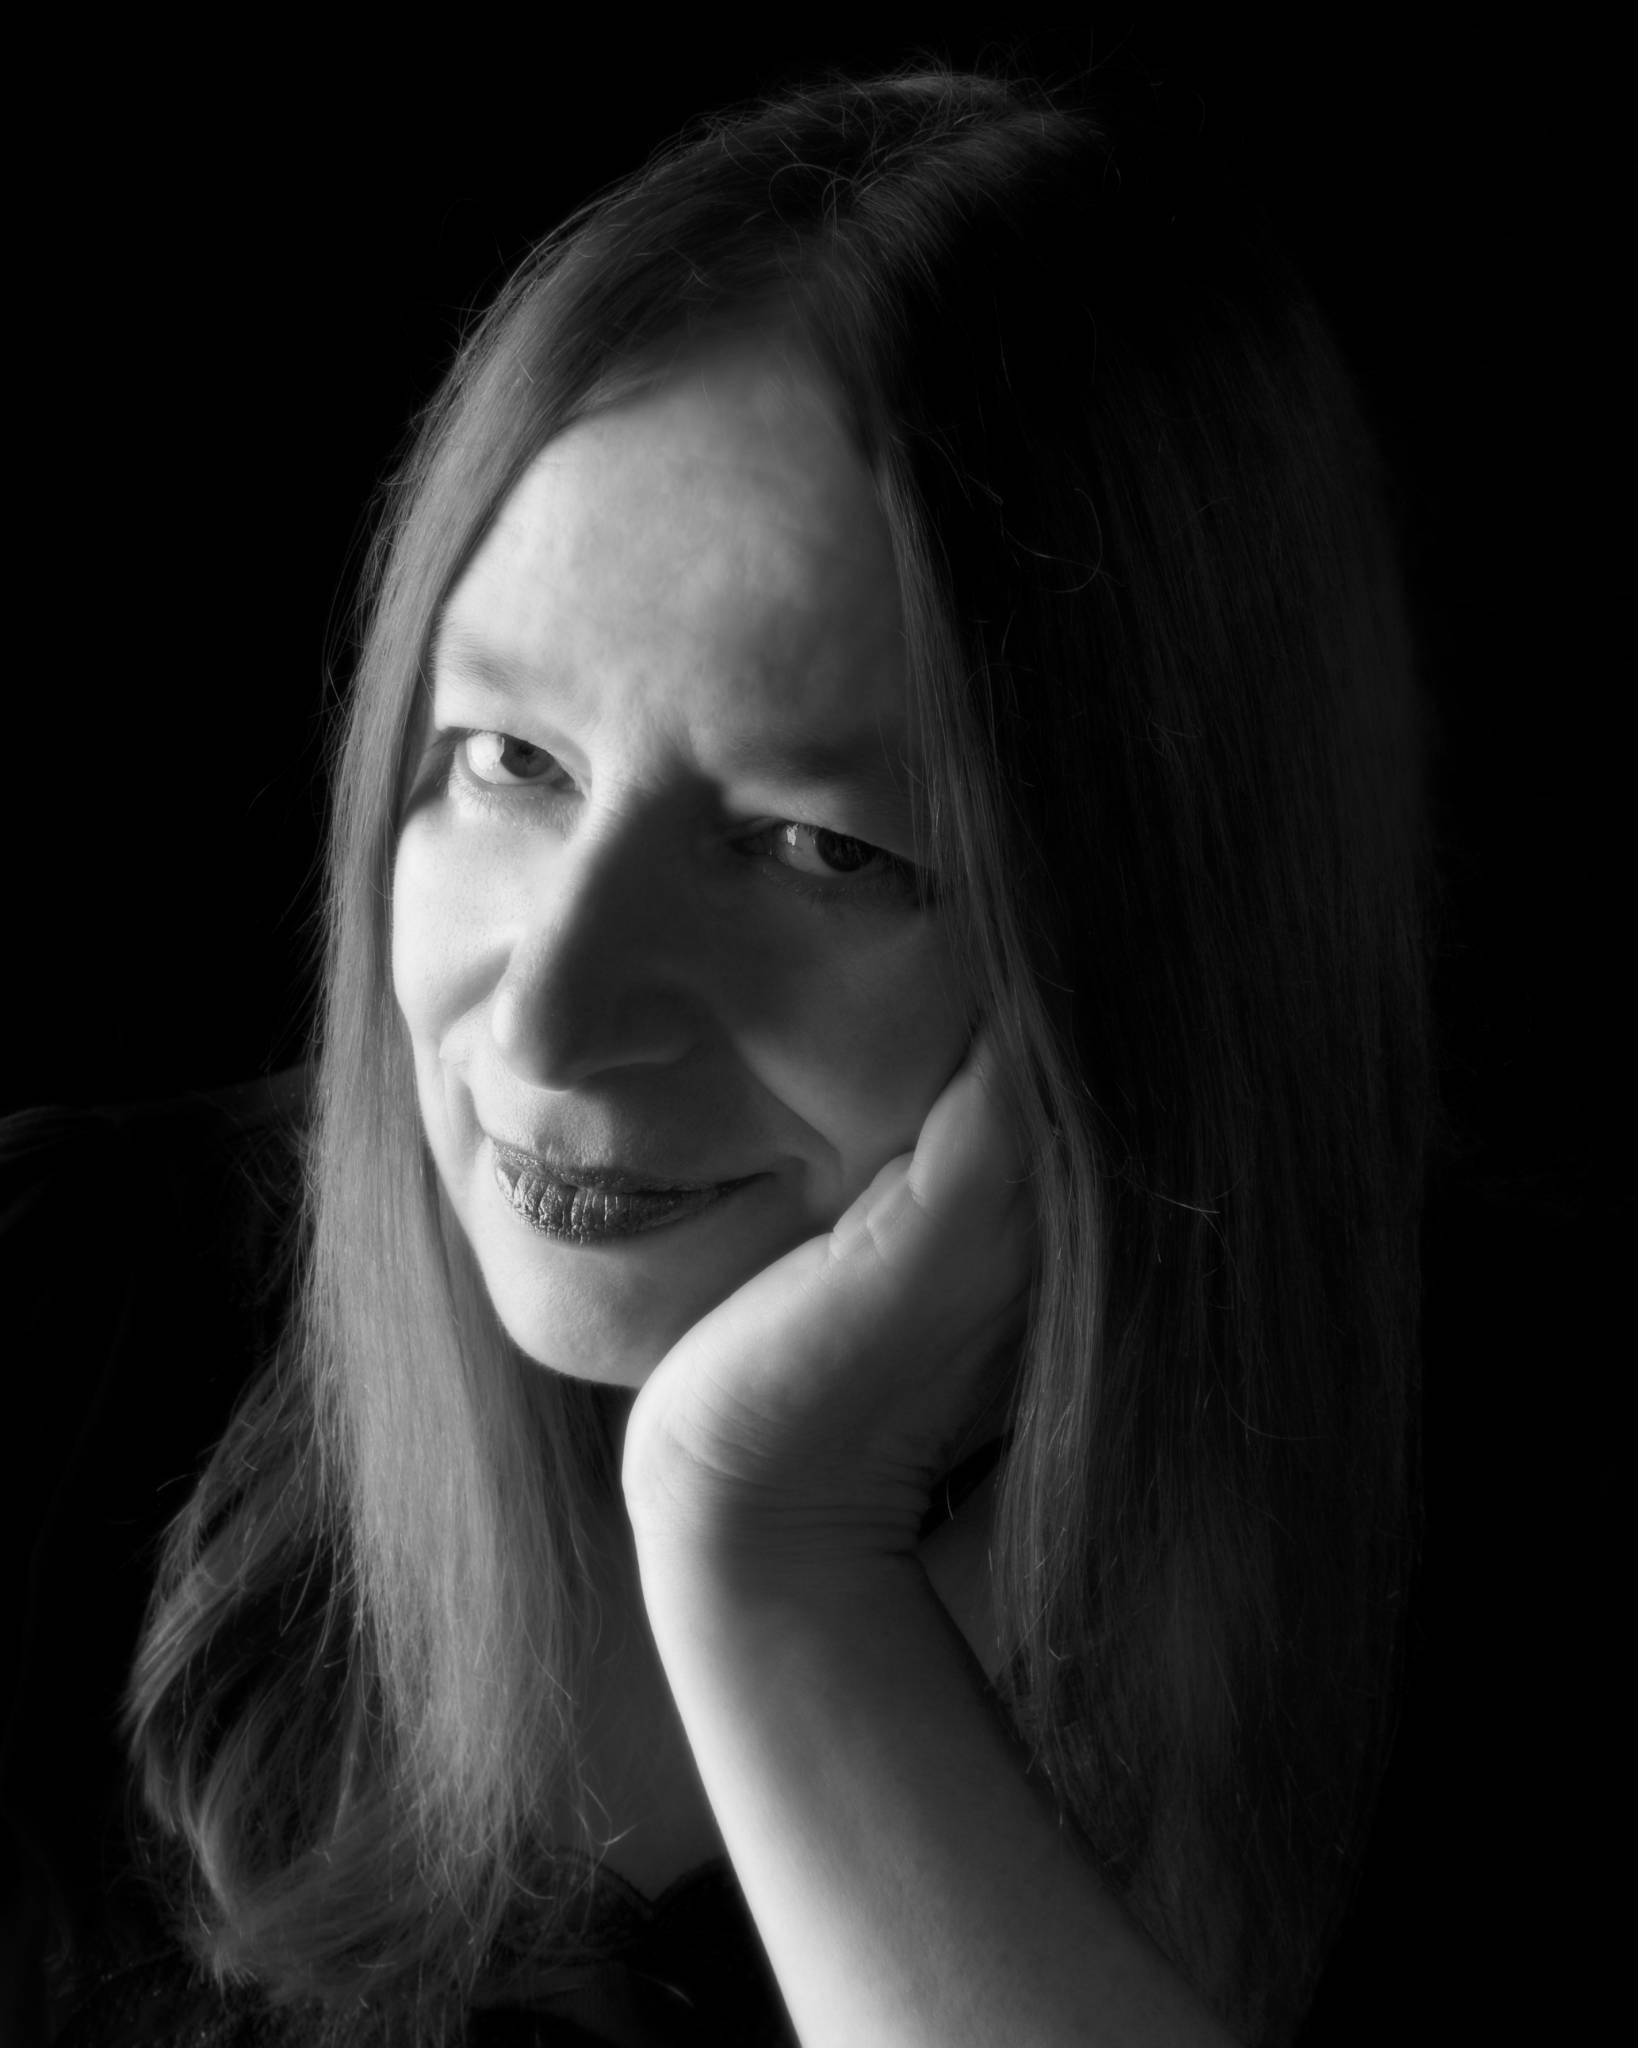 Alison Weir - Katherine Swynford: John of Gaunt & his Scandalous Duchess